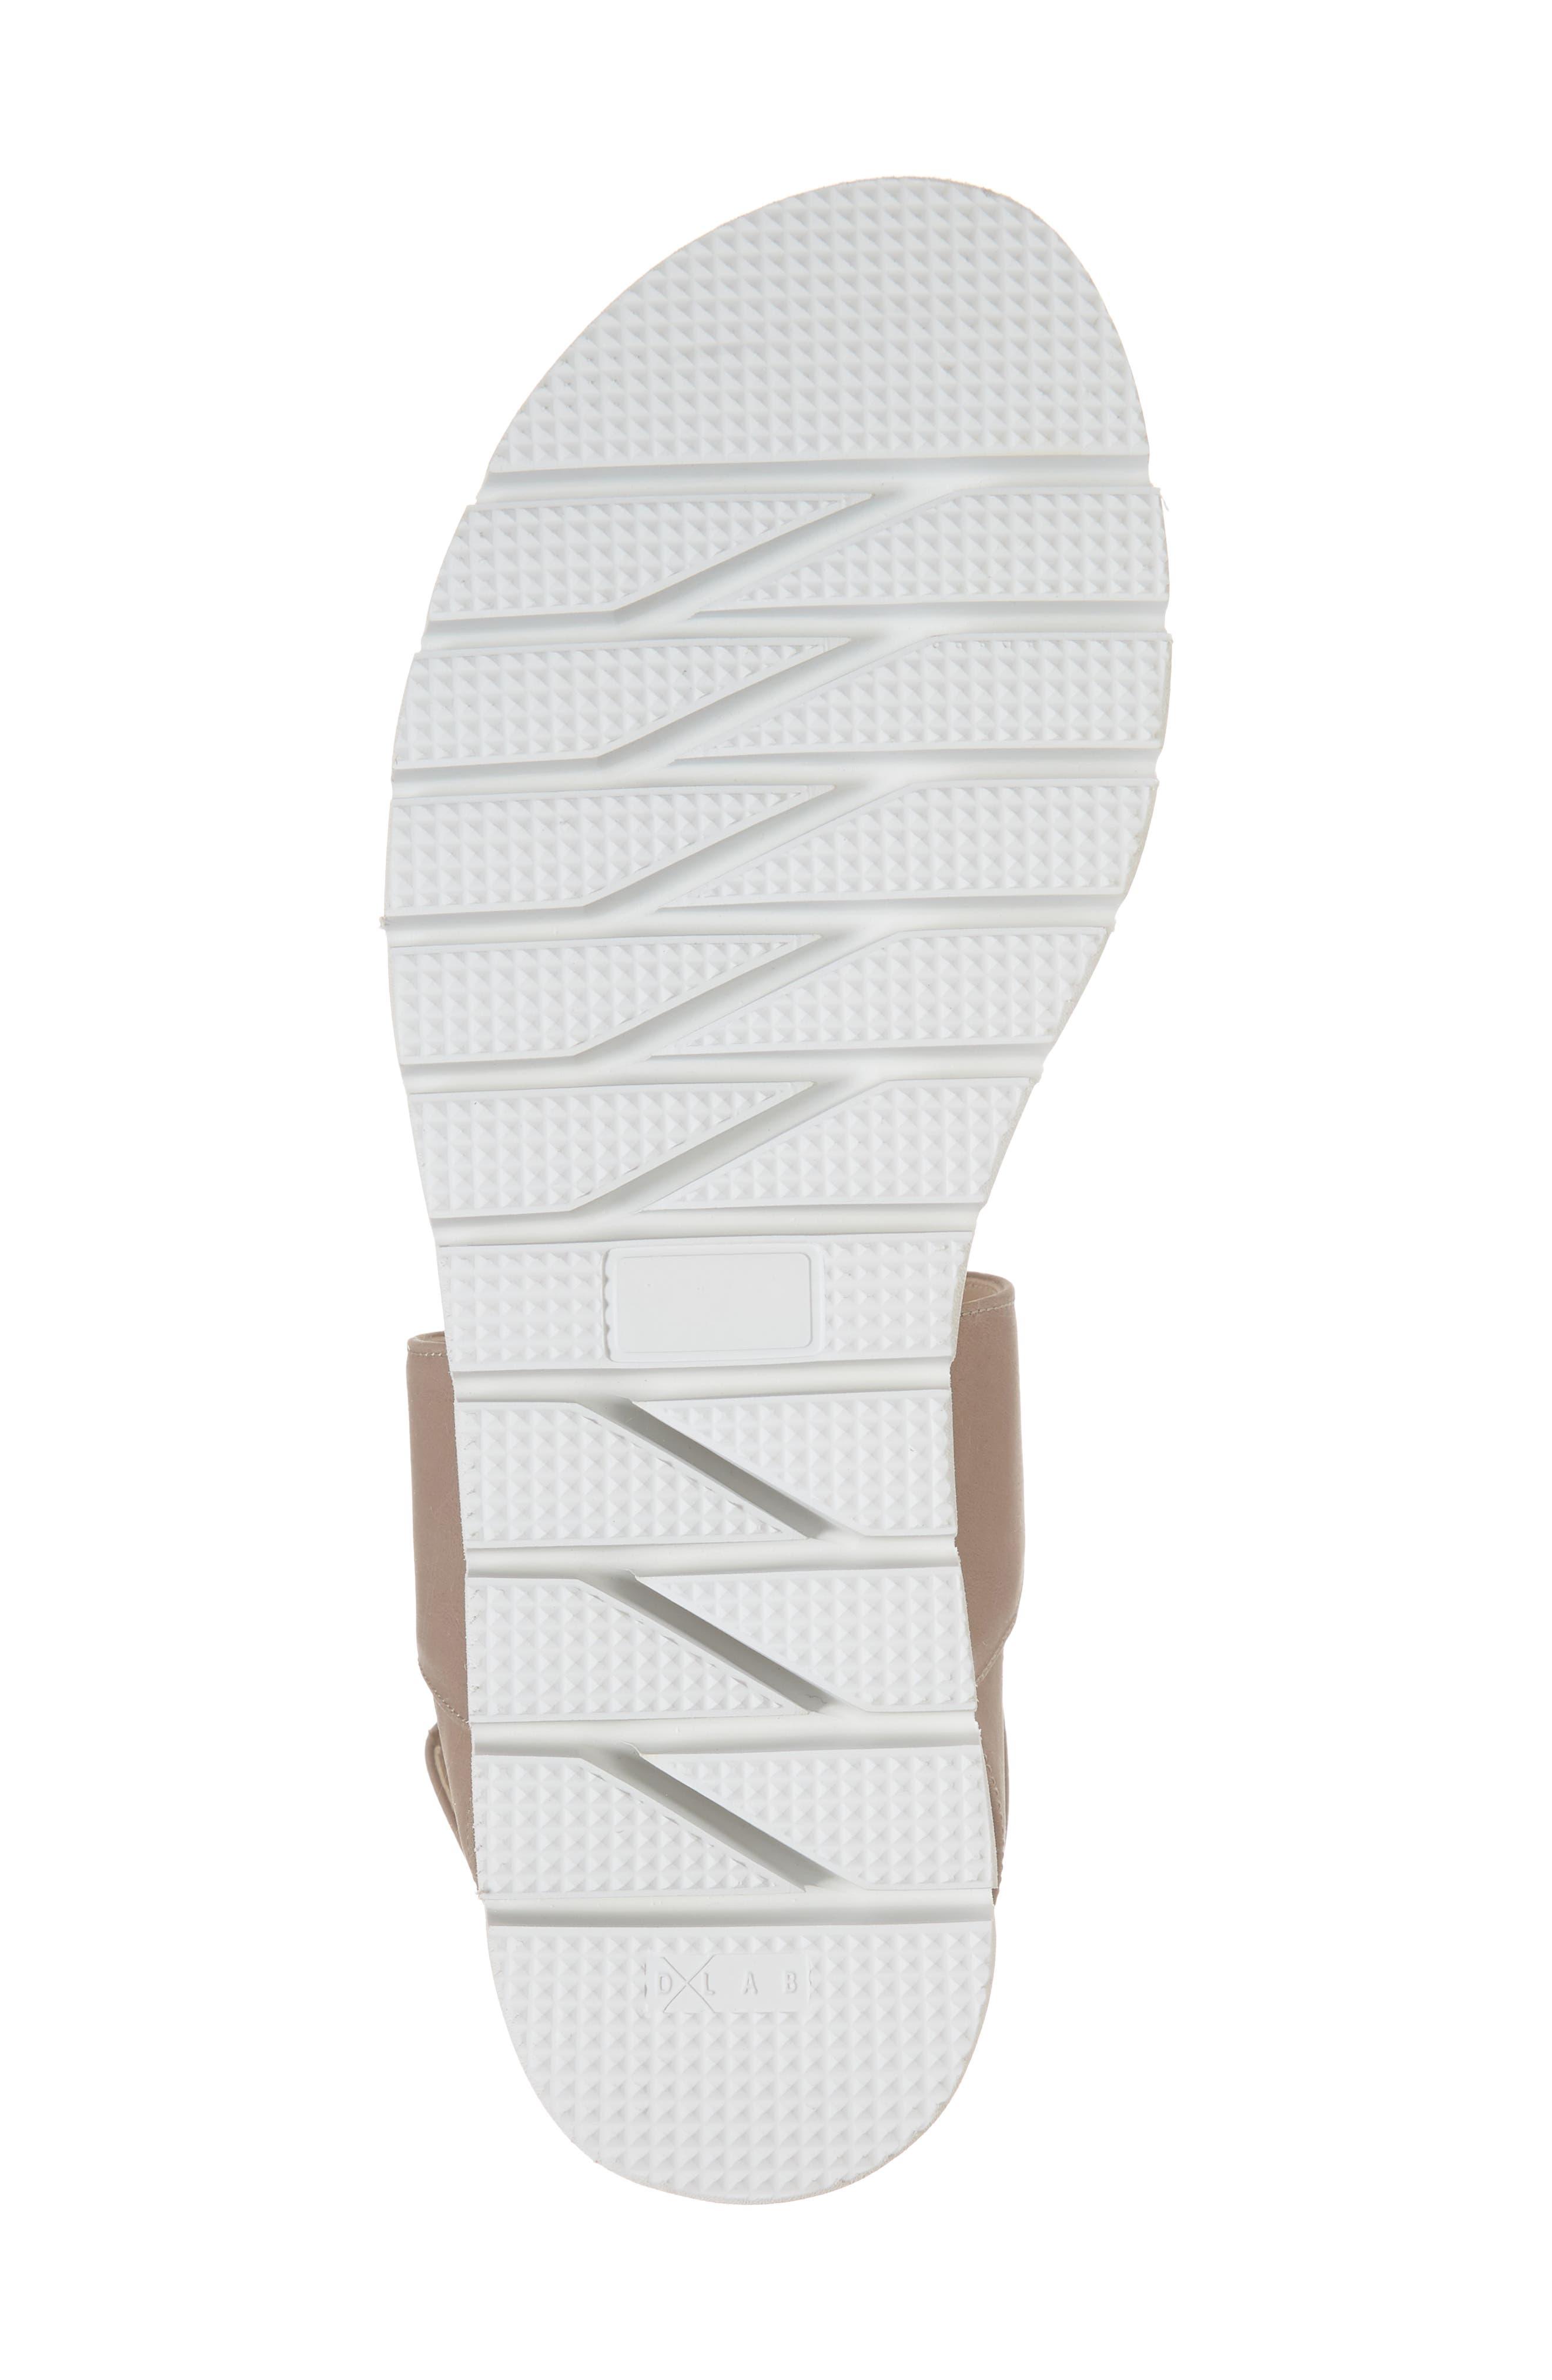 Barlume Sandal,                             Alternate thumbnail 6, color,                             Taupe Leather